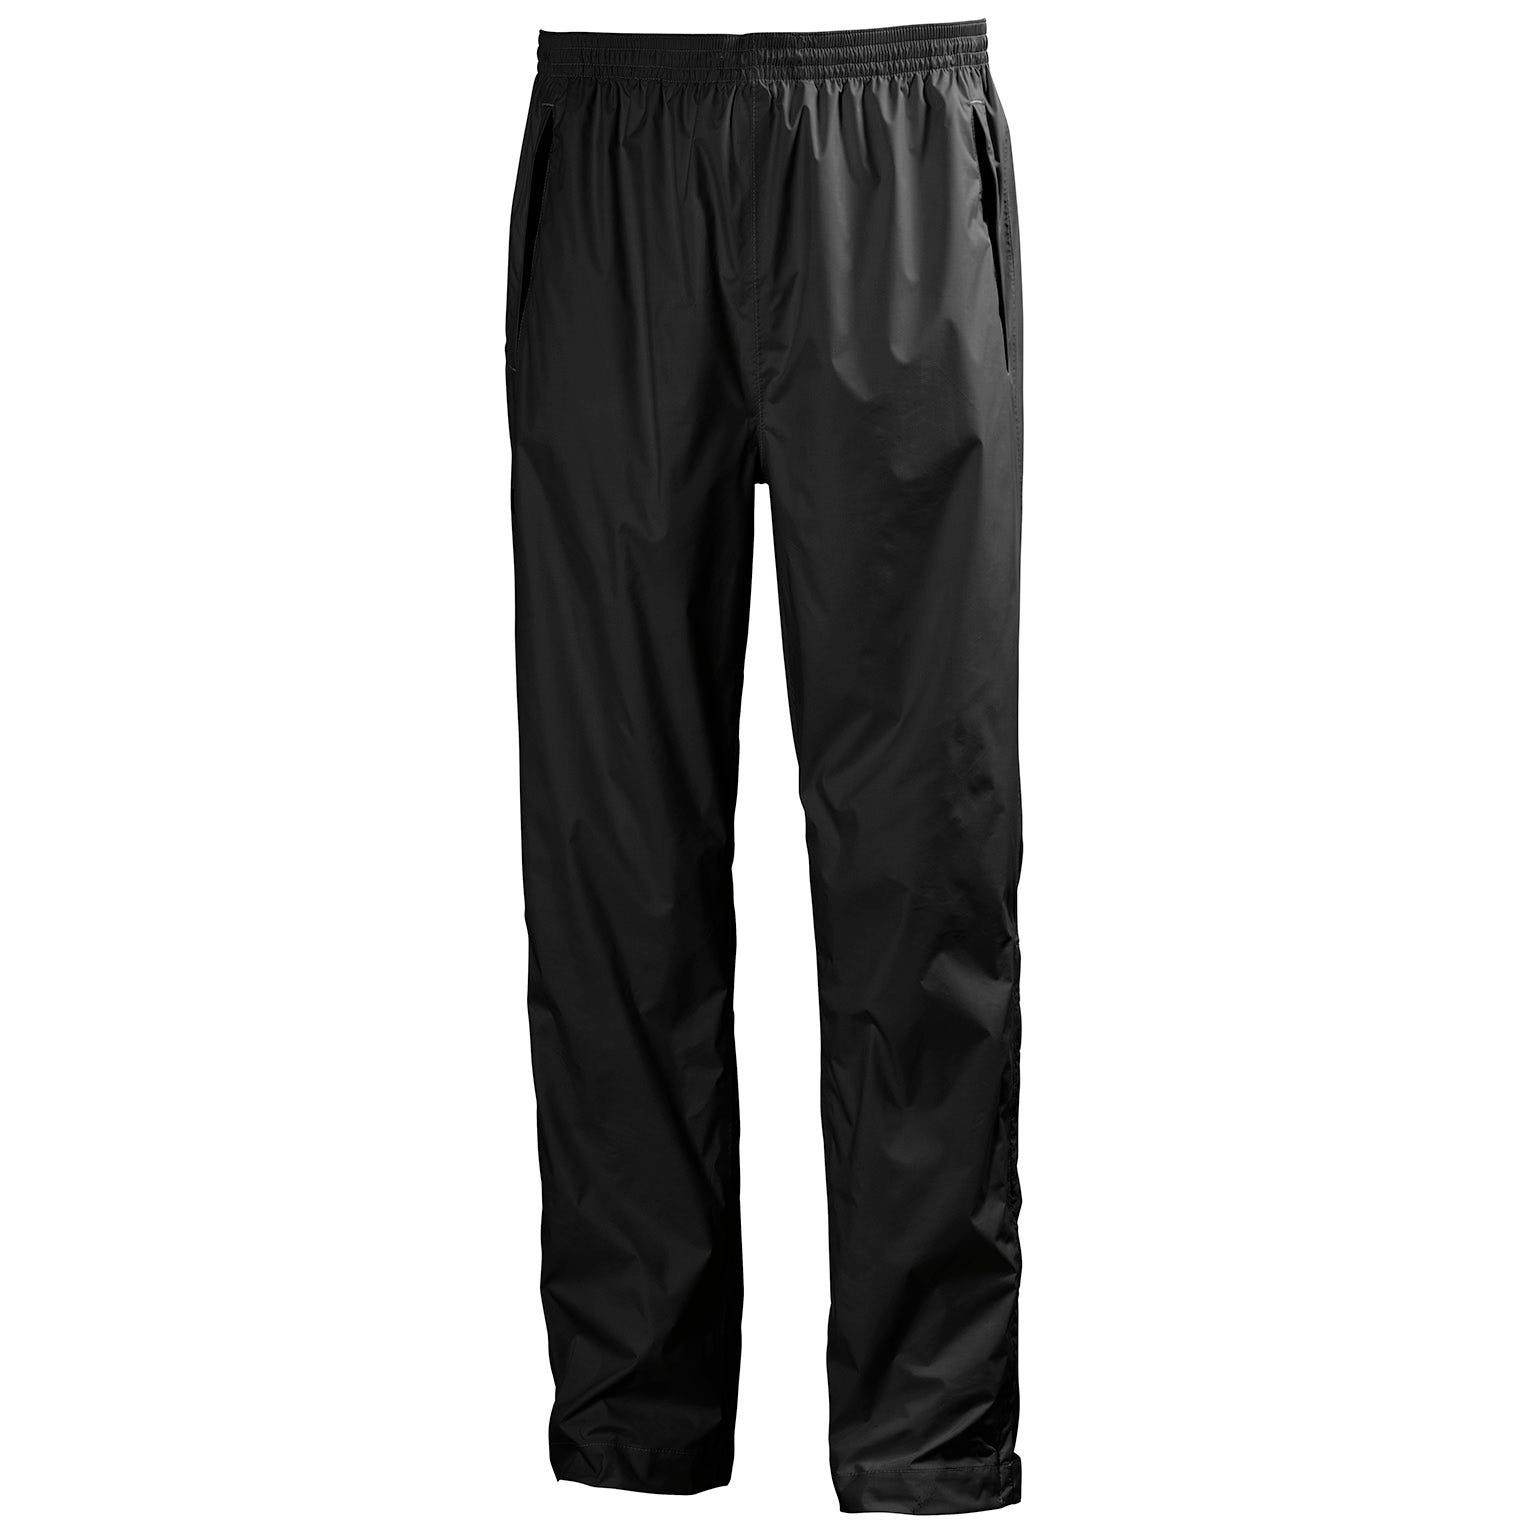 Helly Hansen Loke Pants Mens Hiking Pant Black L